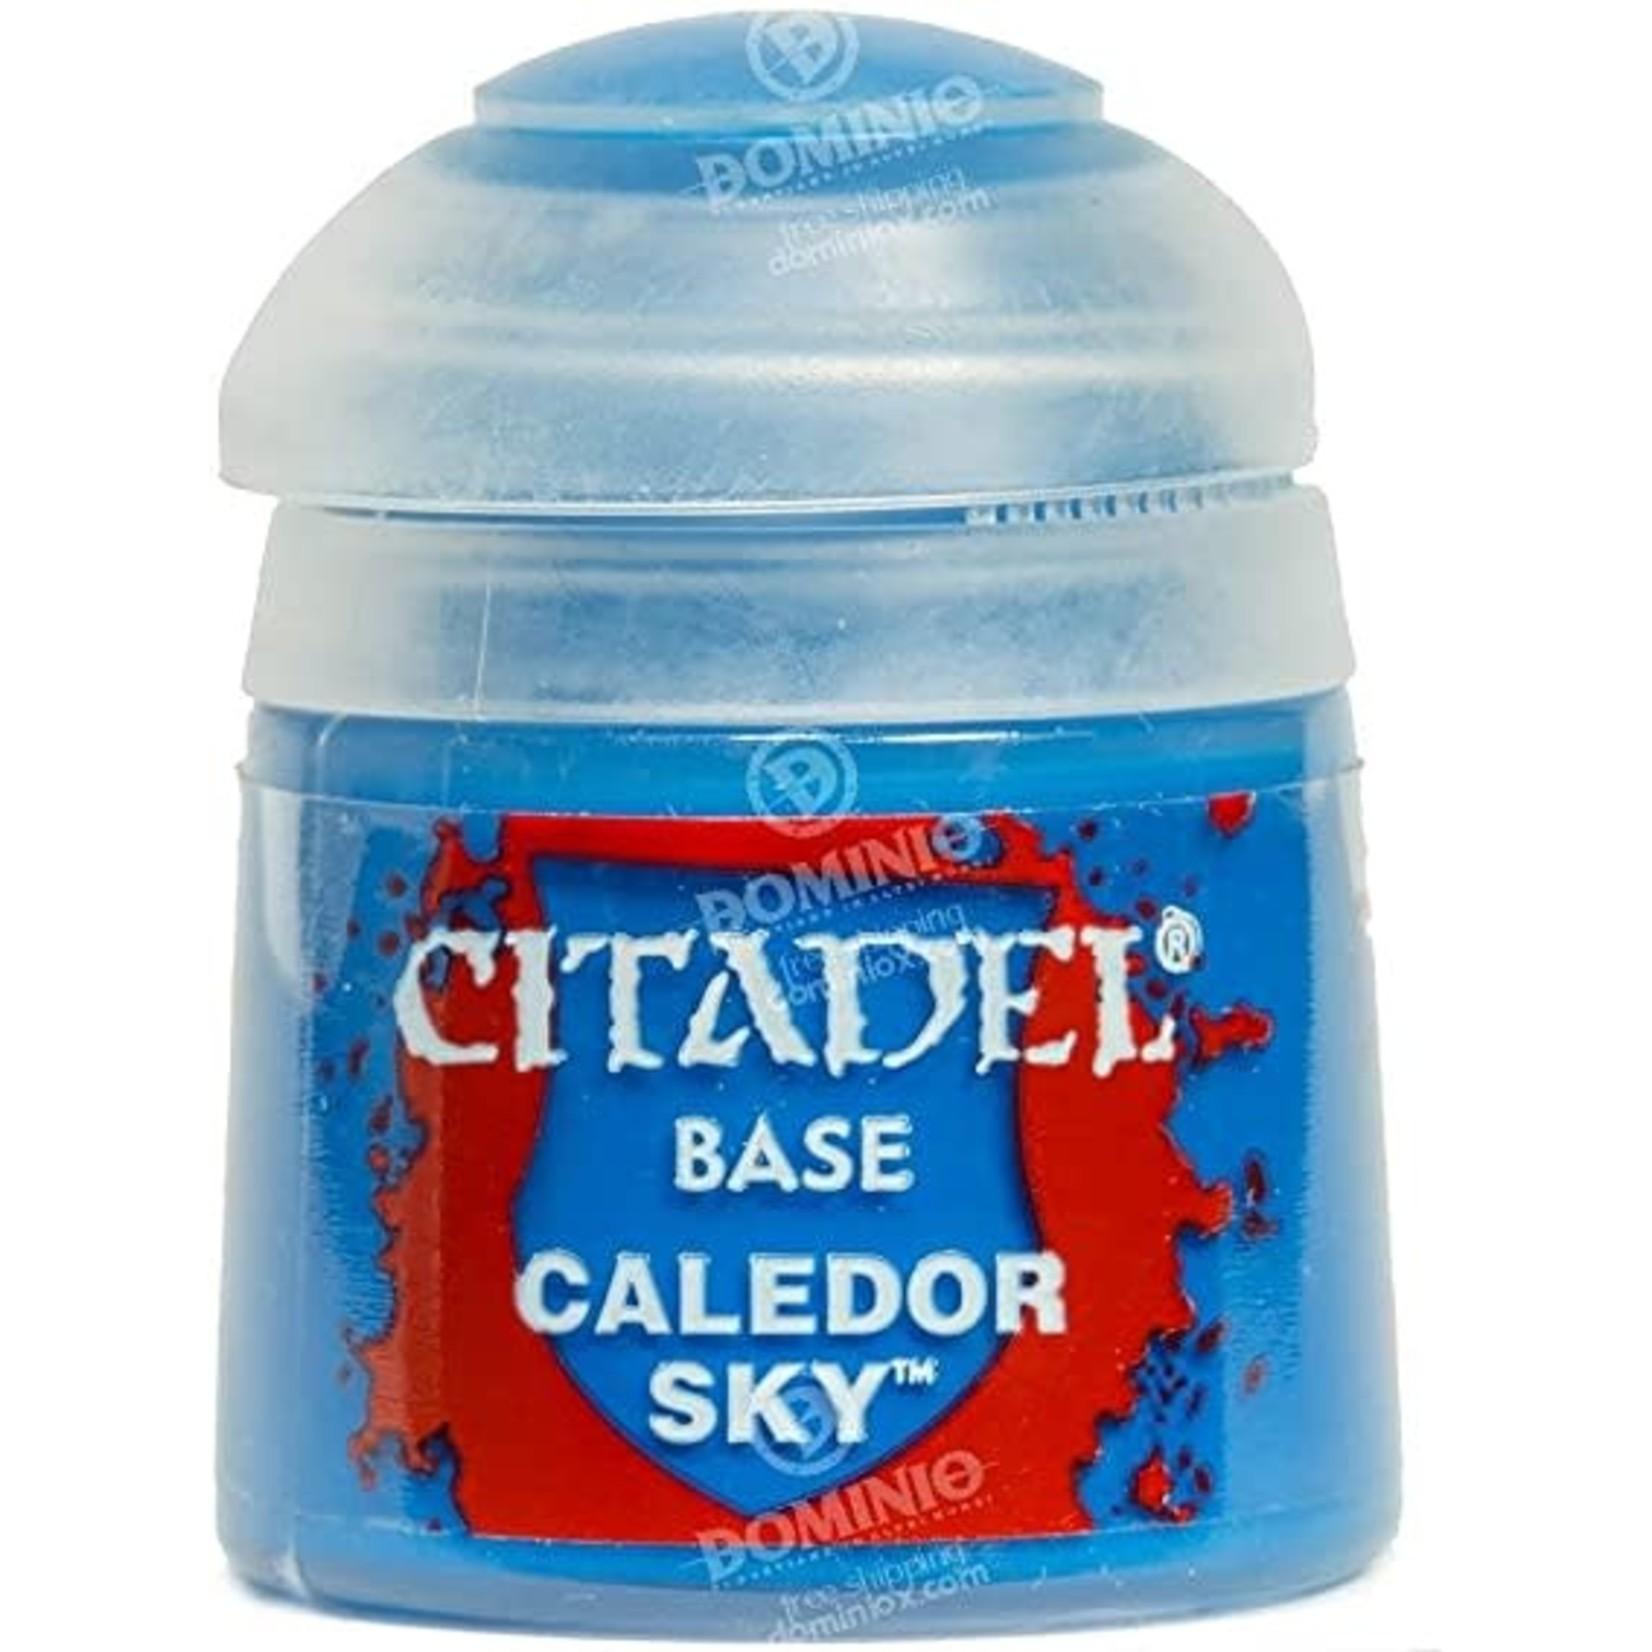 Games Workshop Citadel Paint: Caledor Sky 12ml